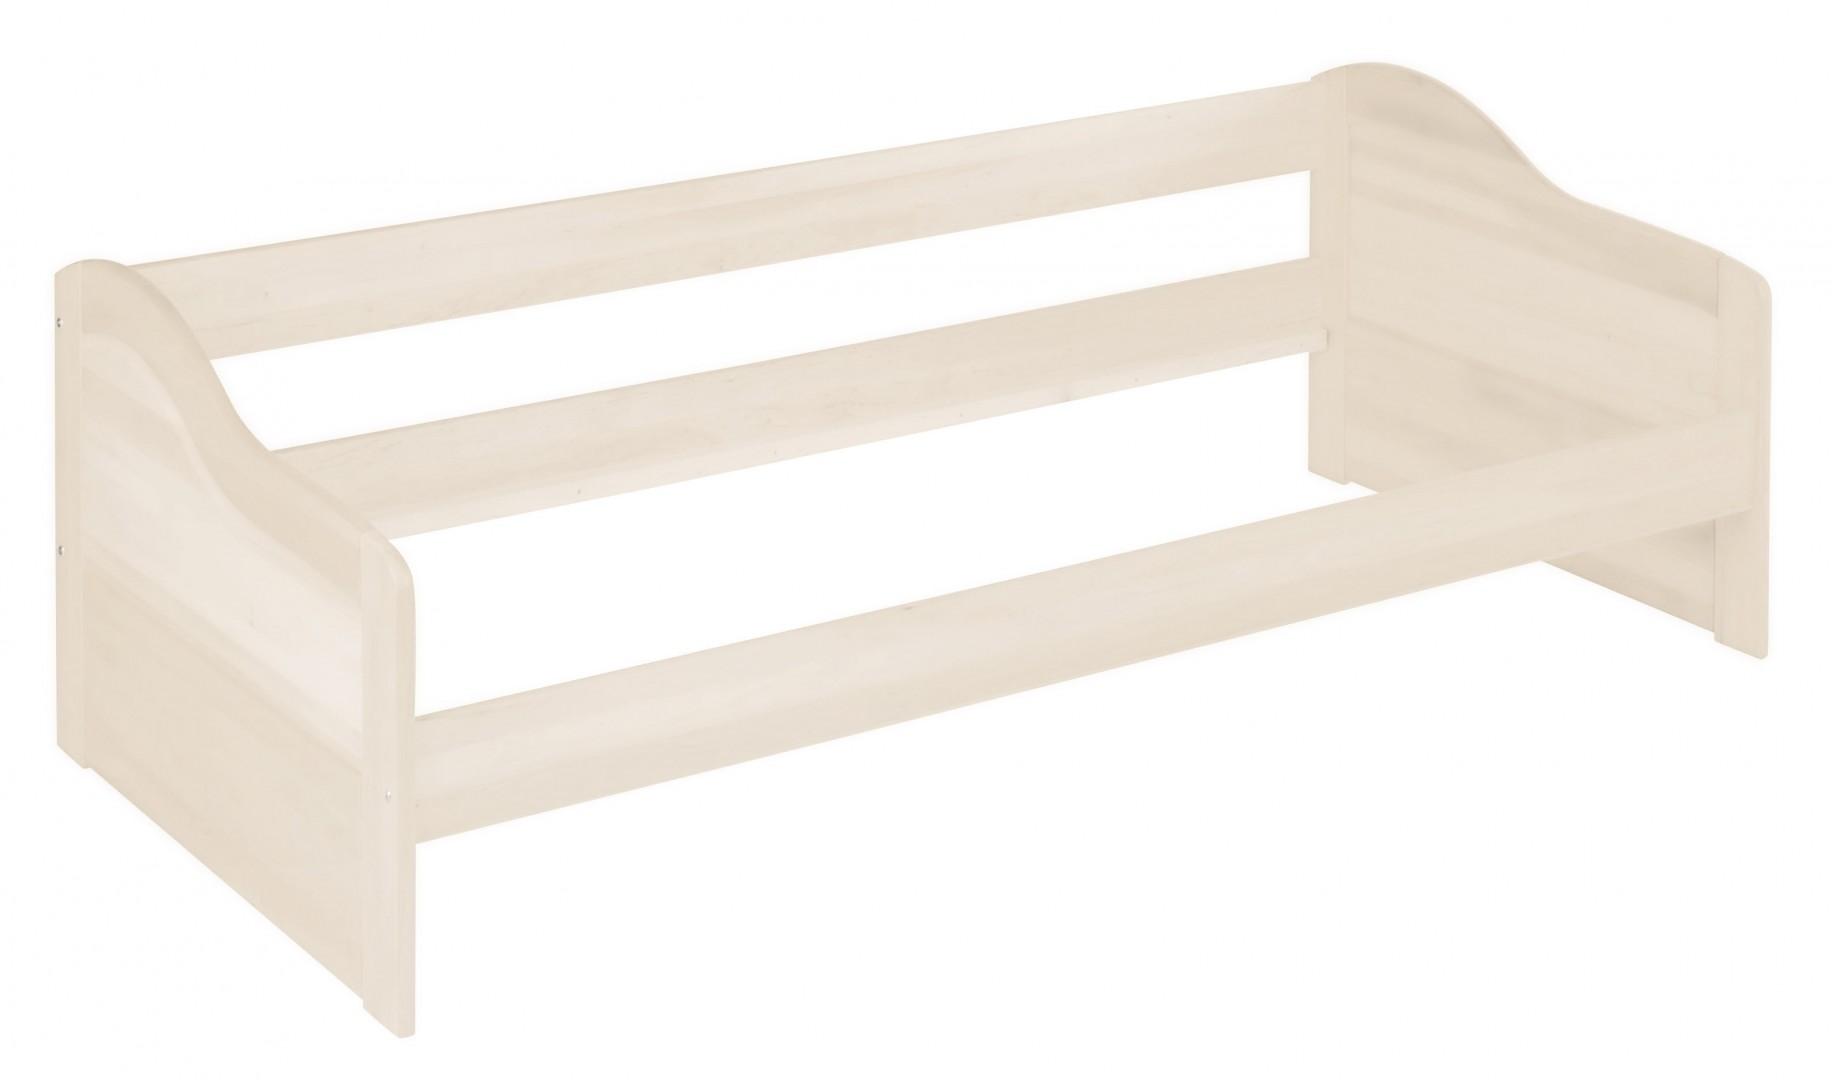 biokinder nico funktionsbett schlafsofa 90x200 cm kiefer wei lasiert. Black Bedroom Furniture Sets. Home Design Ideas